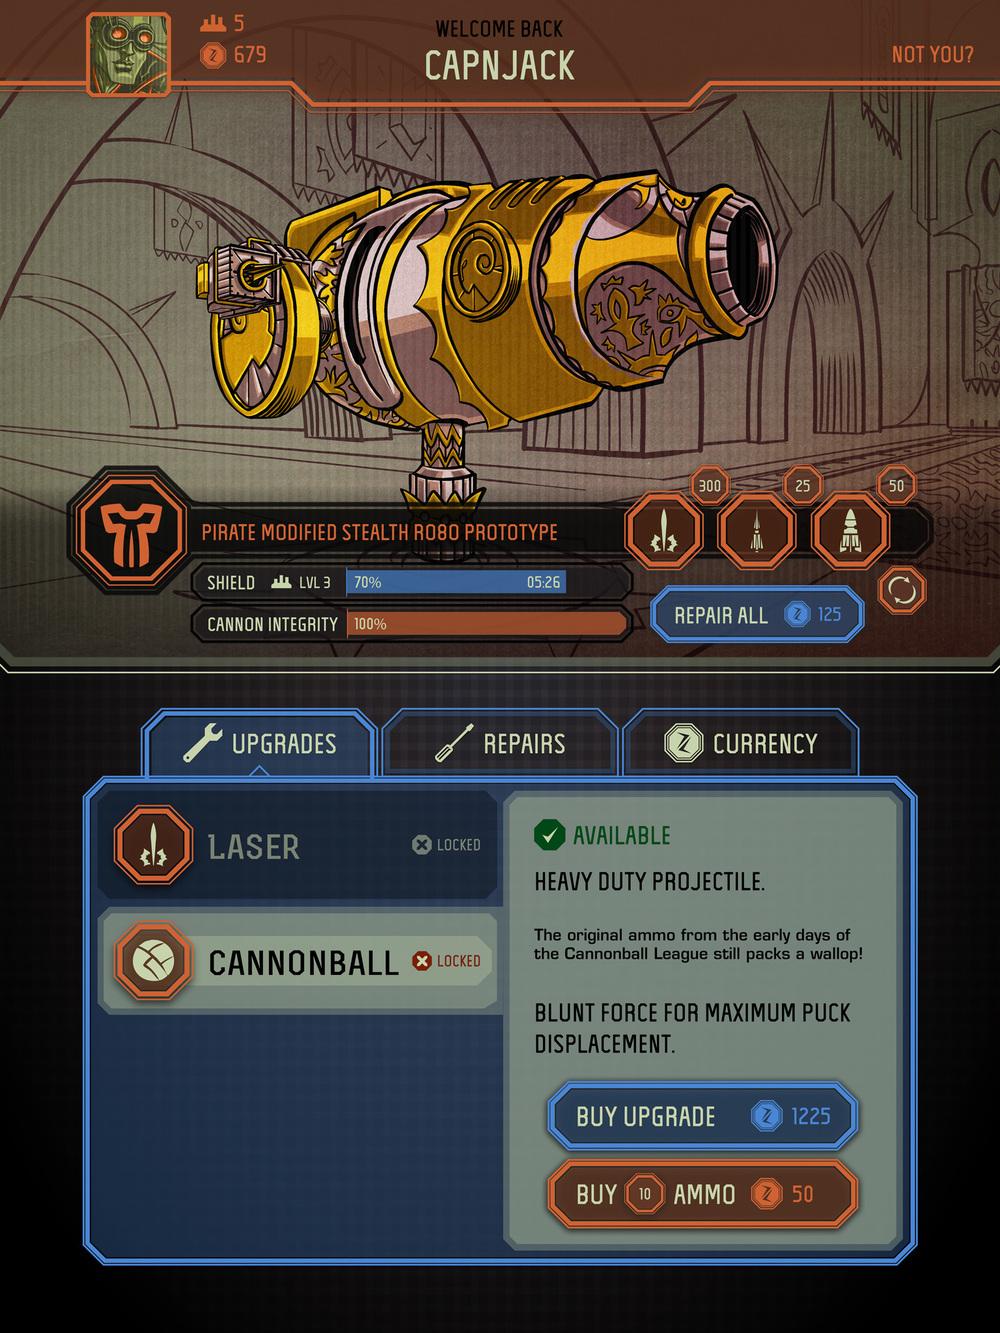 CannonPortrait_Imperial_FullUpgrades_Ram.jpg